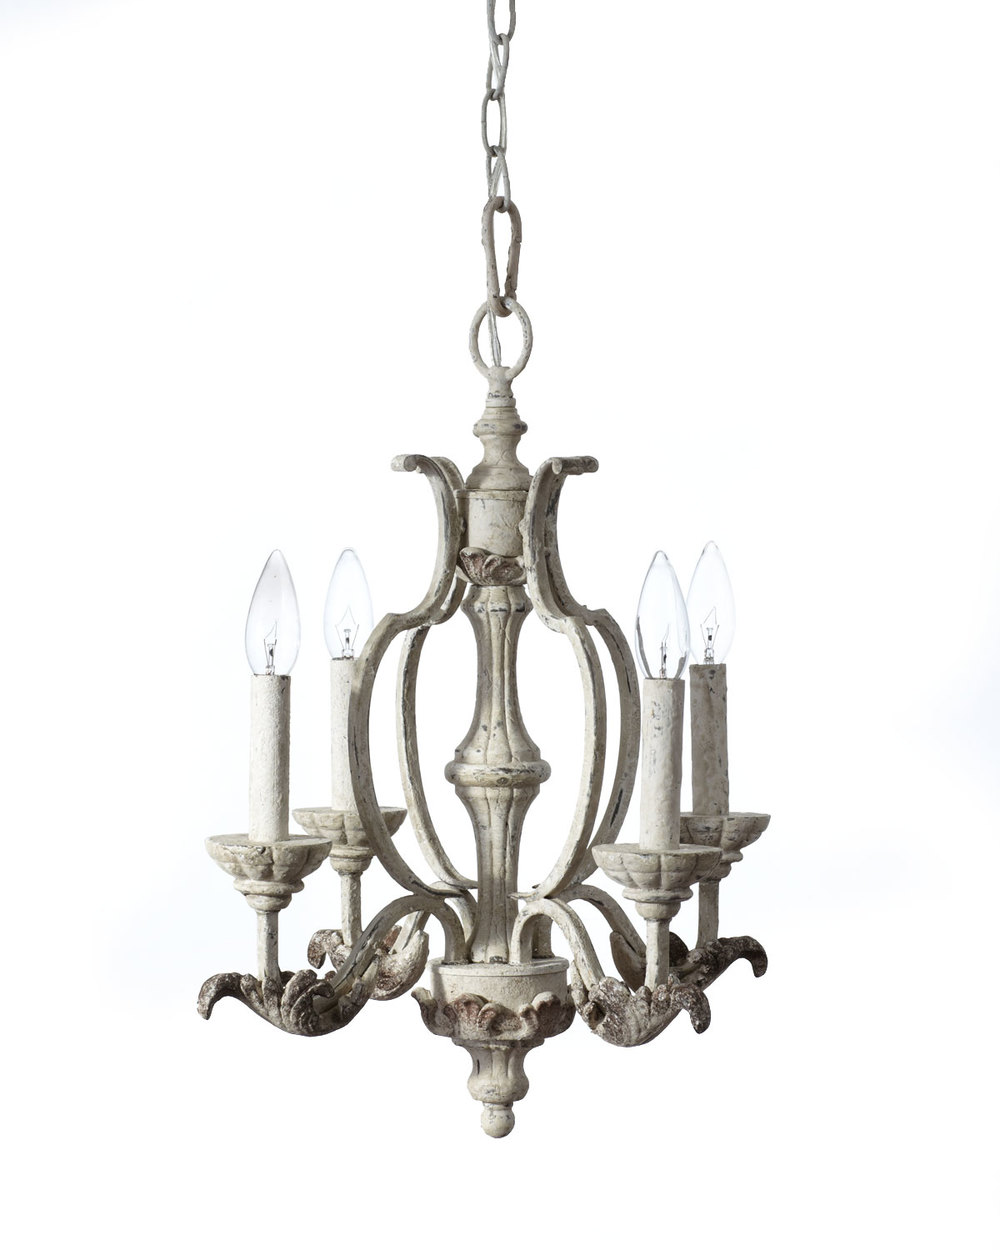 Trend A pretty chandelier in a delicate gray patina Dreamy